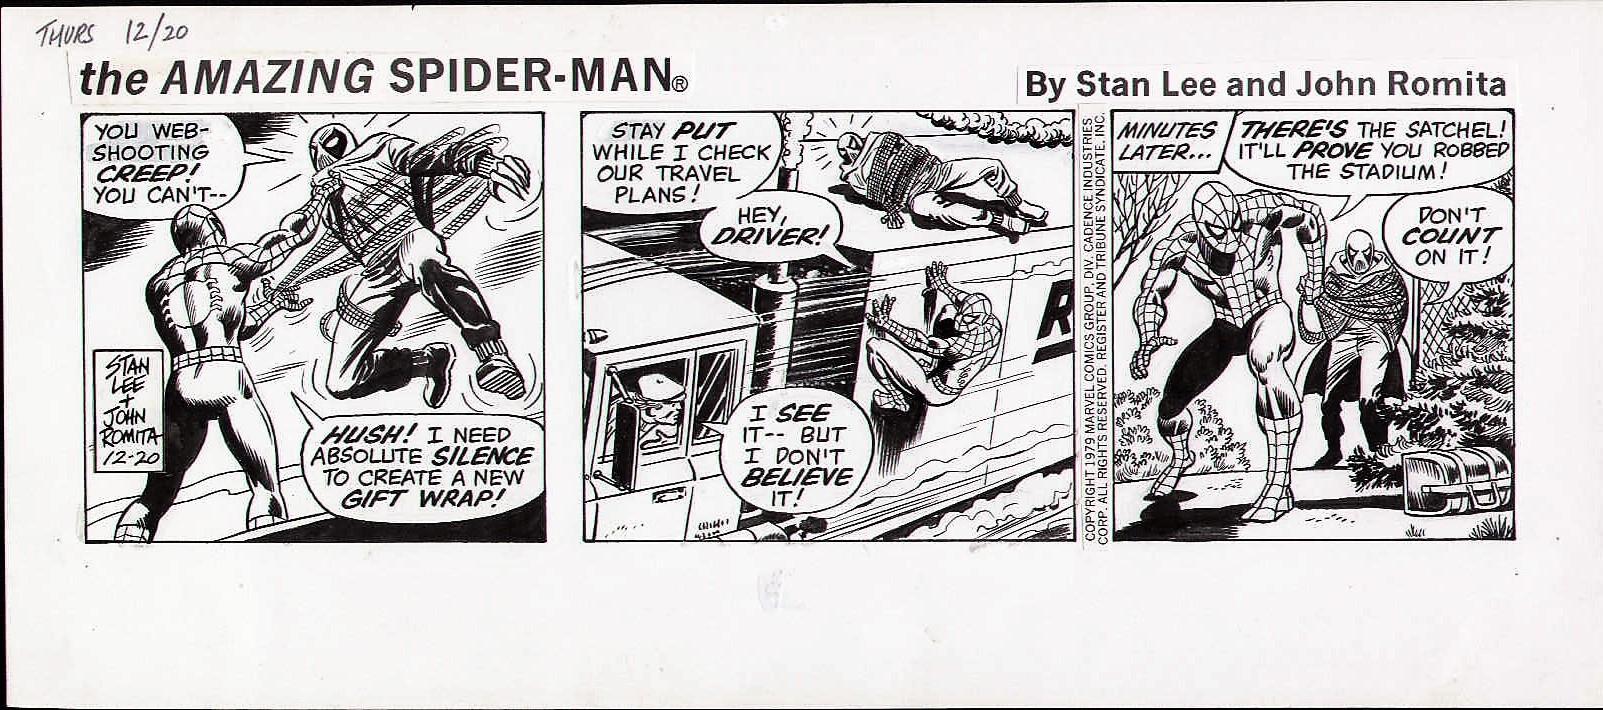 1979 AMAZING SPIDERMAN ORIGINAL NEWSPAPER COMIC STRIP ART